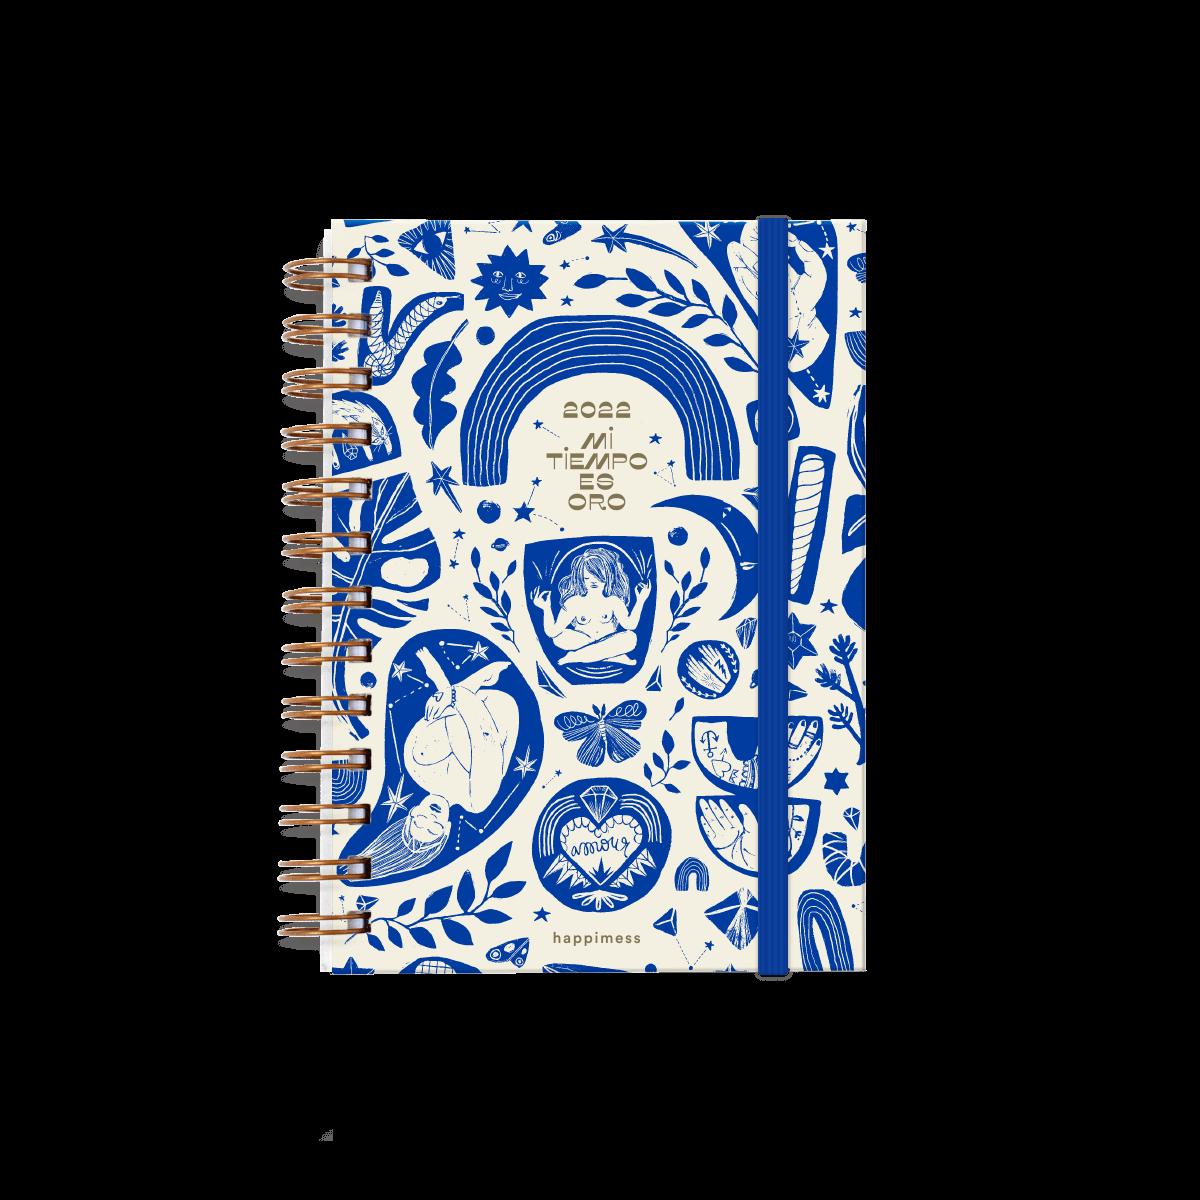 Agenda anillada Modelo Happimess Mi tiempo es oro, cerrada, tapa dura, de frente, con elástico azul e ilustración de tapa en tonos azules sobre fondo blanco.